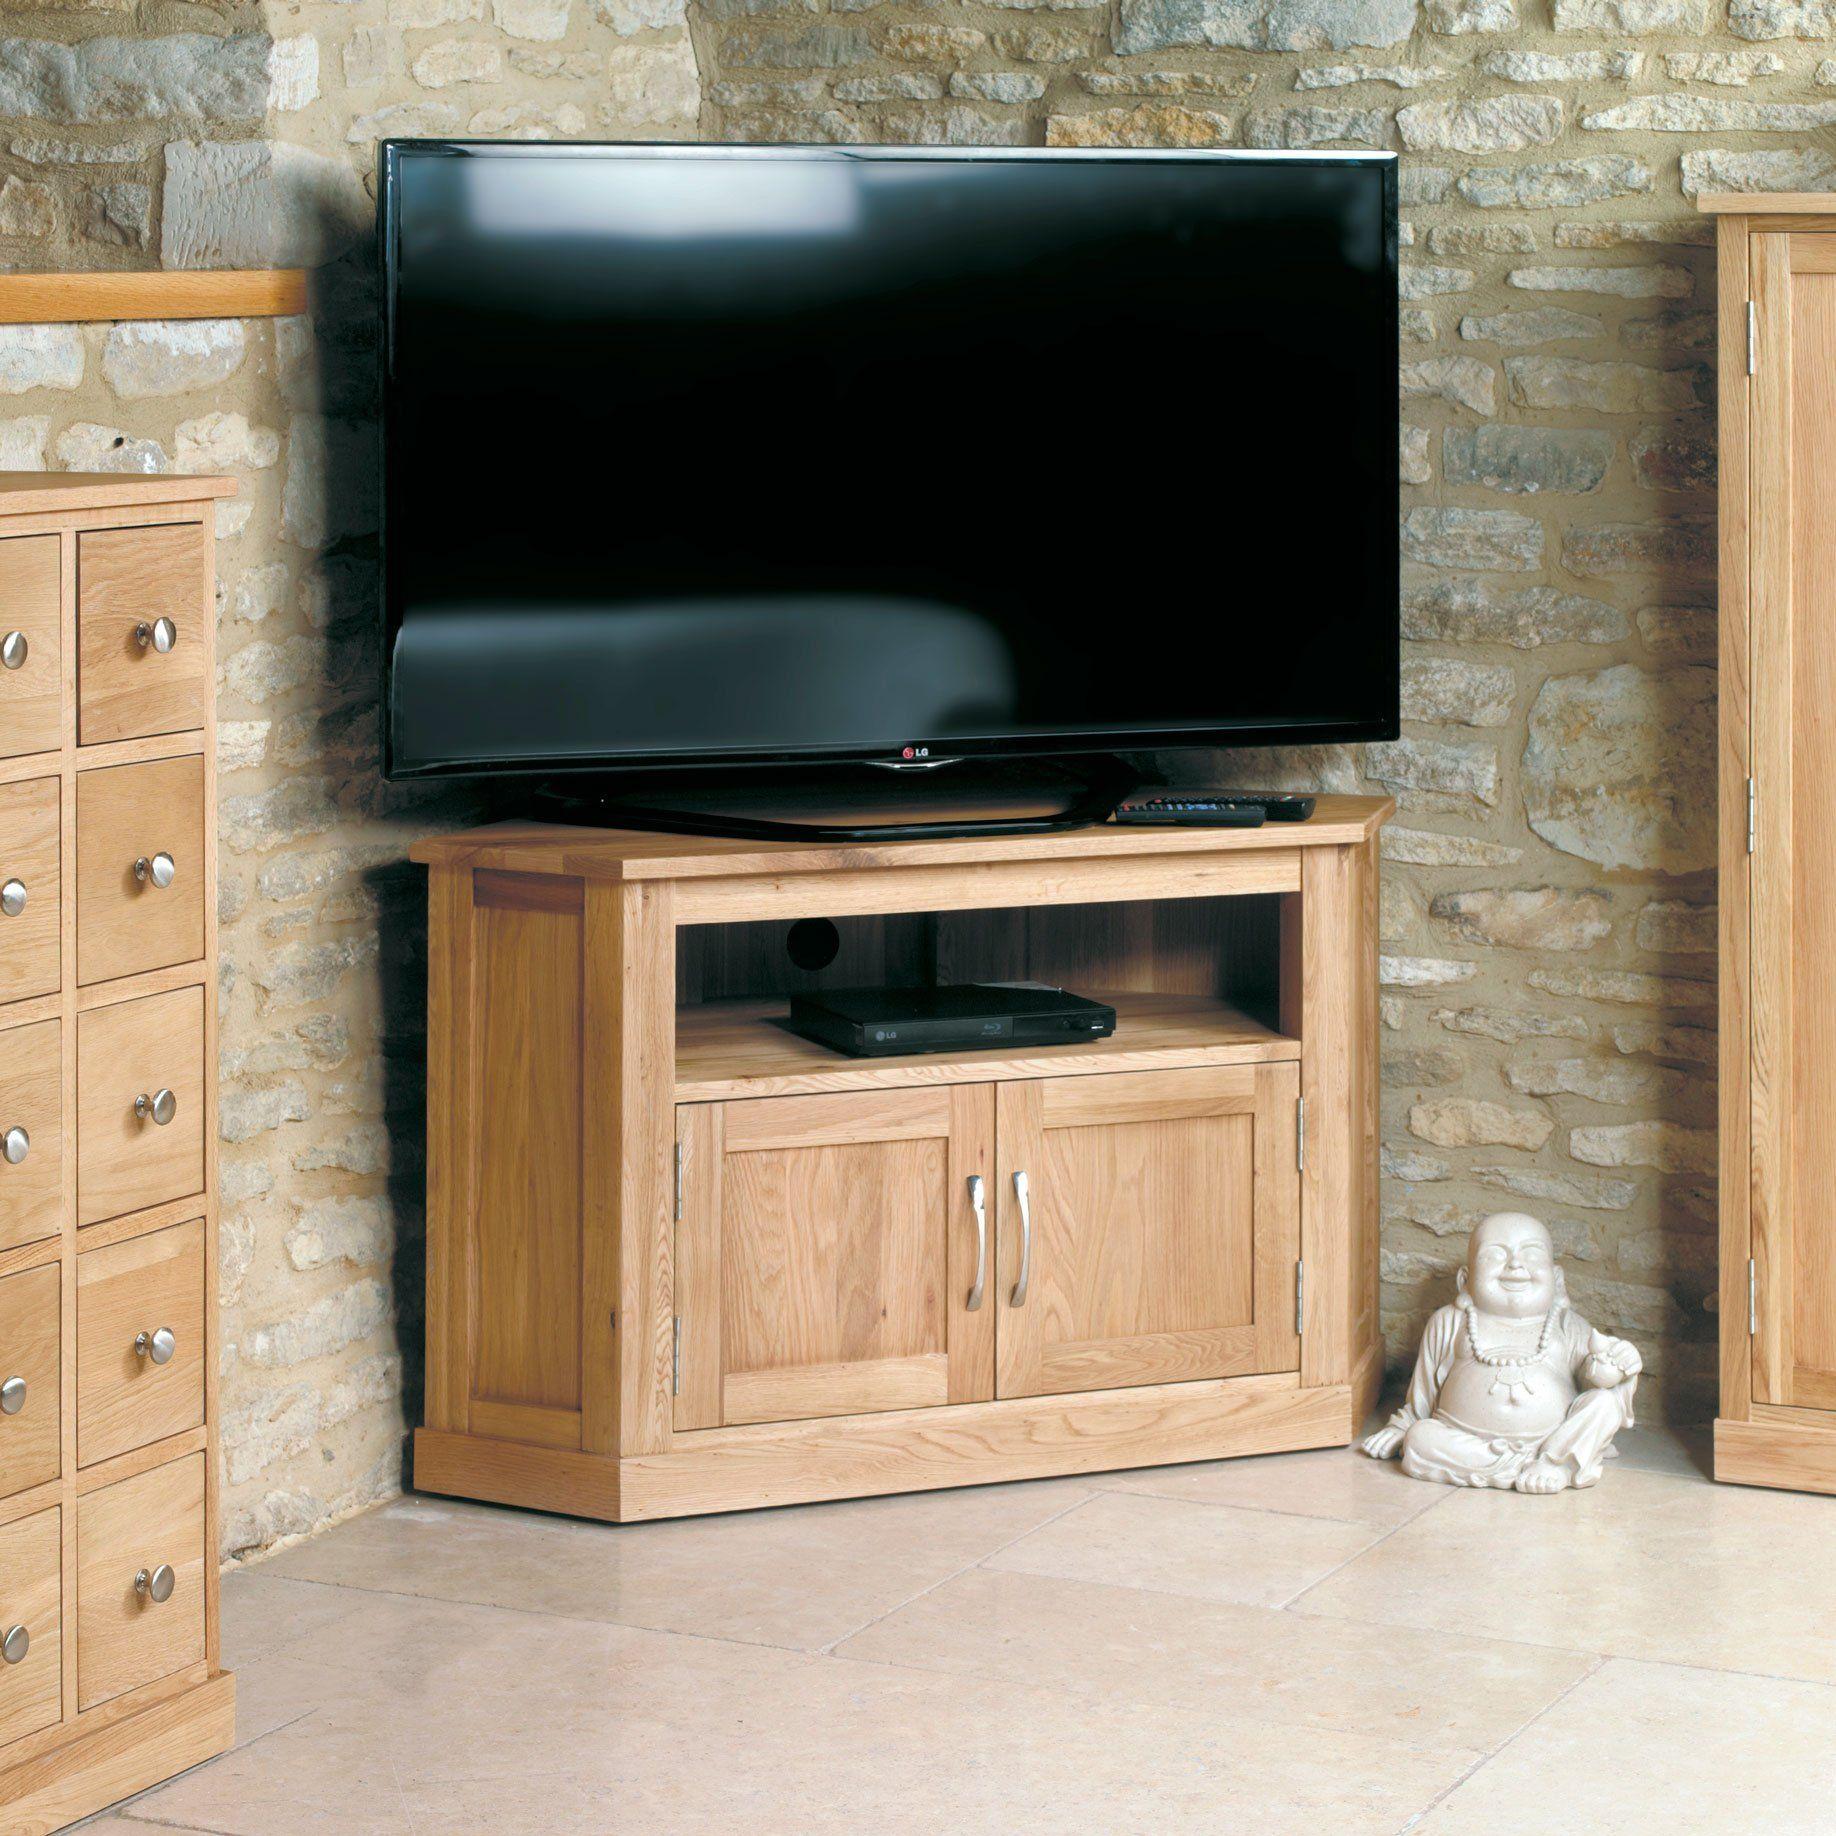 Mobel Oak Corner Television Cabinet In 2021 Corner Tv Unit Television Cabinet Oak Corner Tv Unit